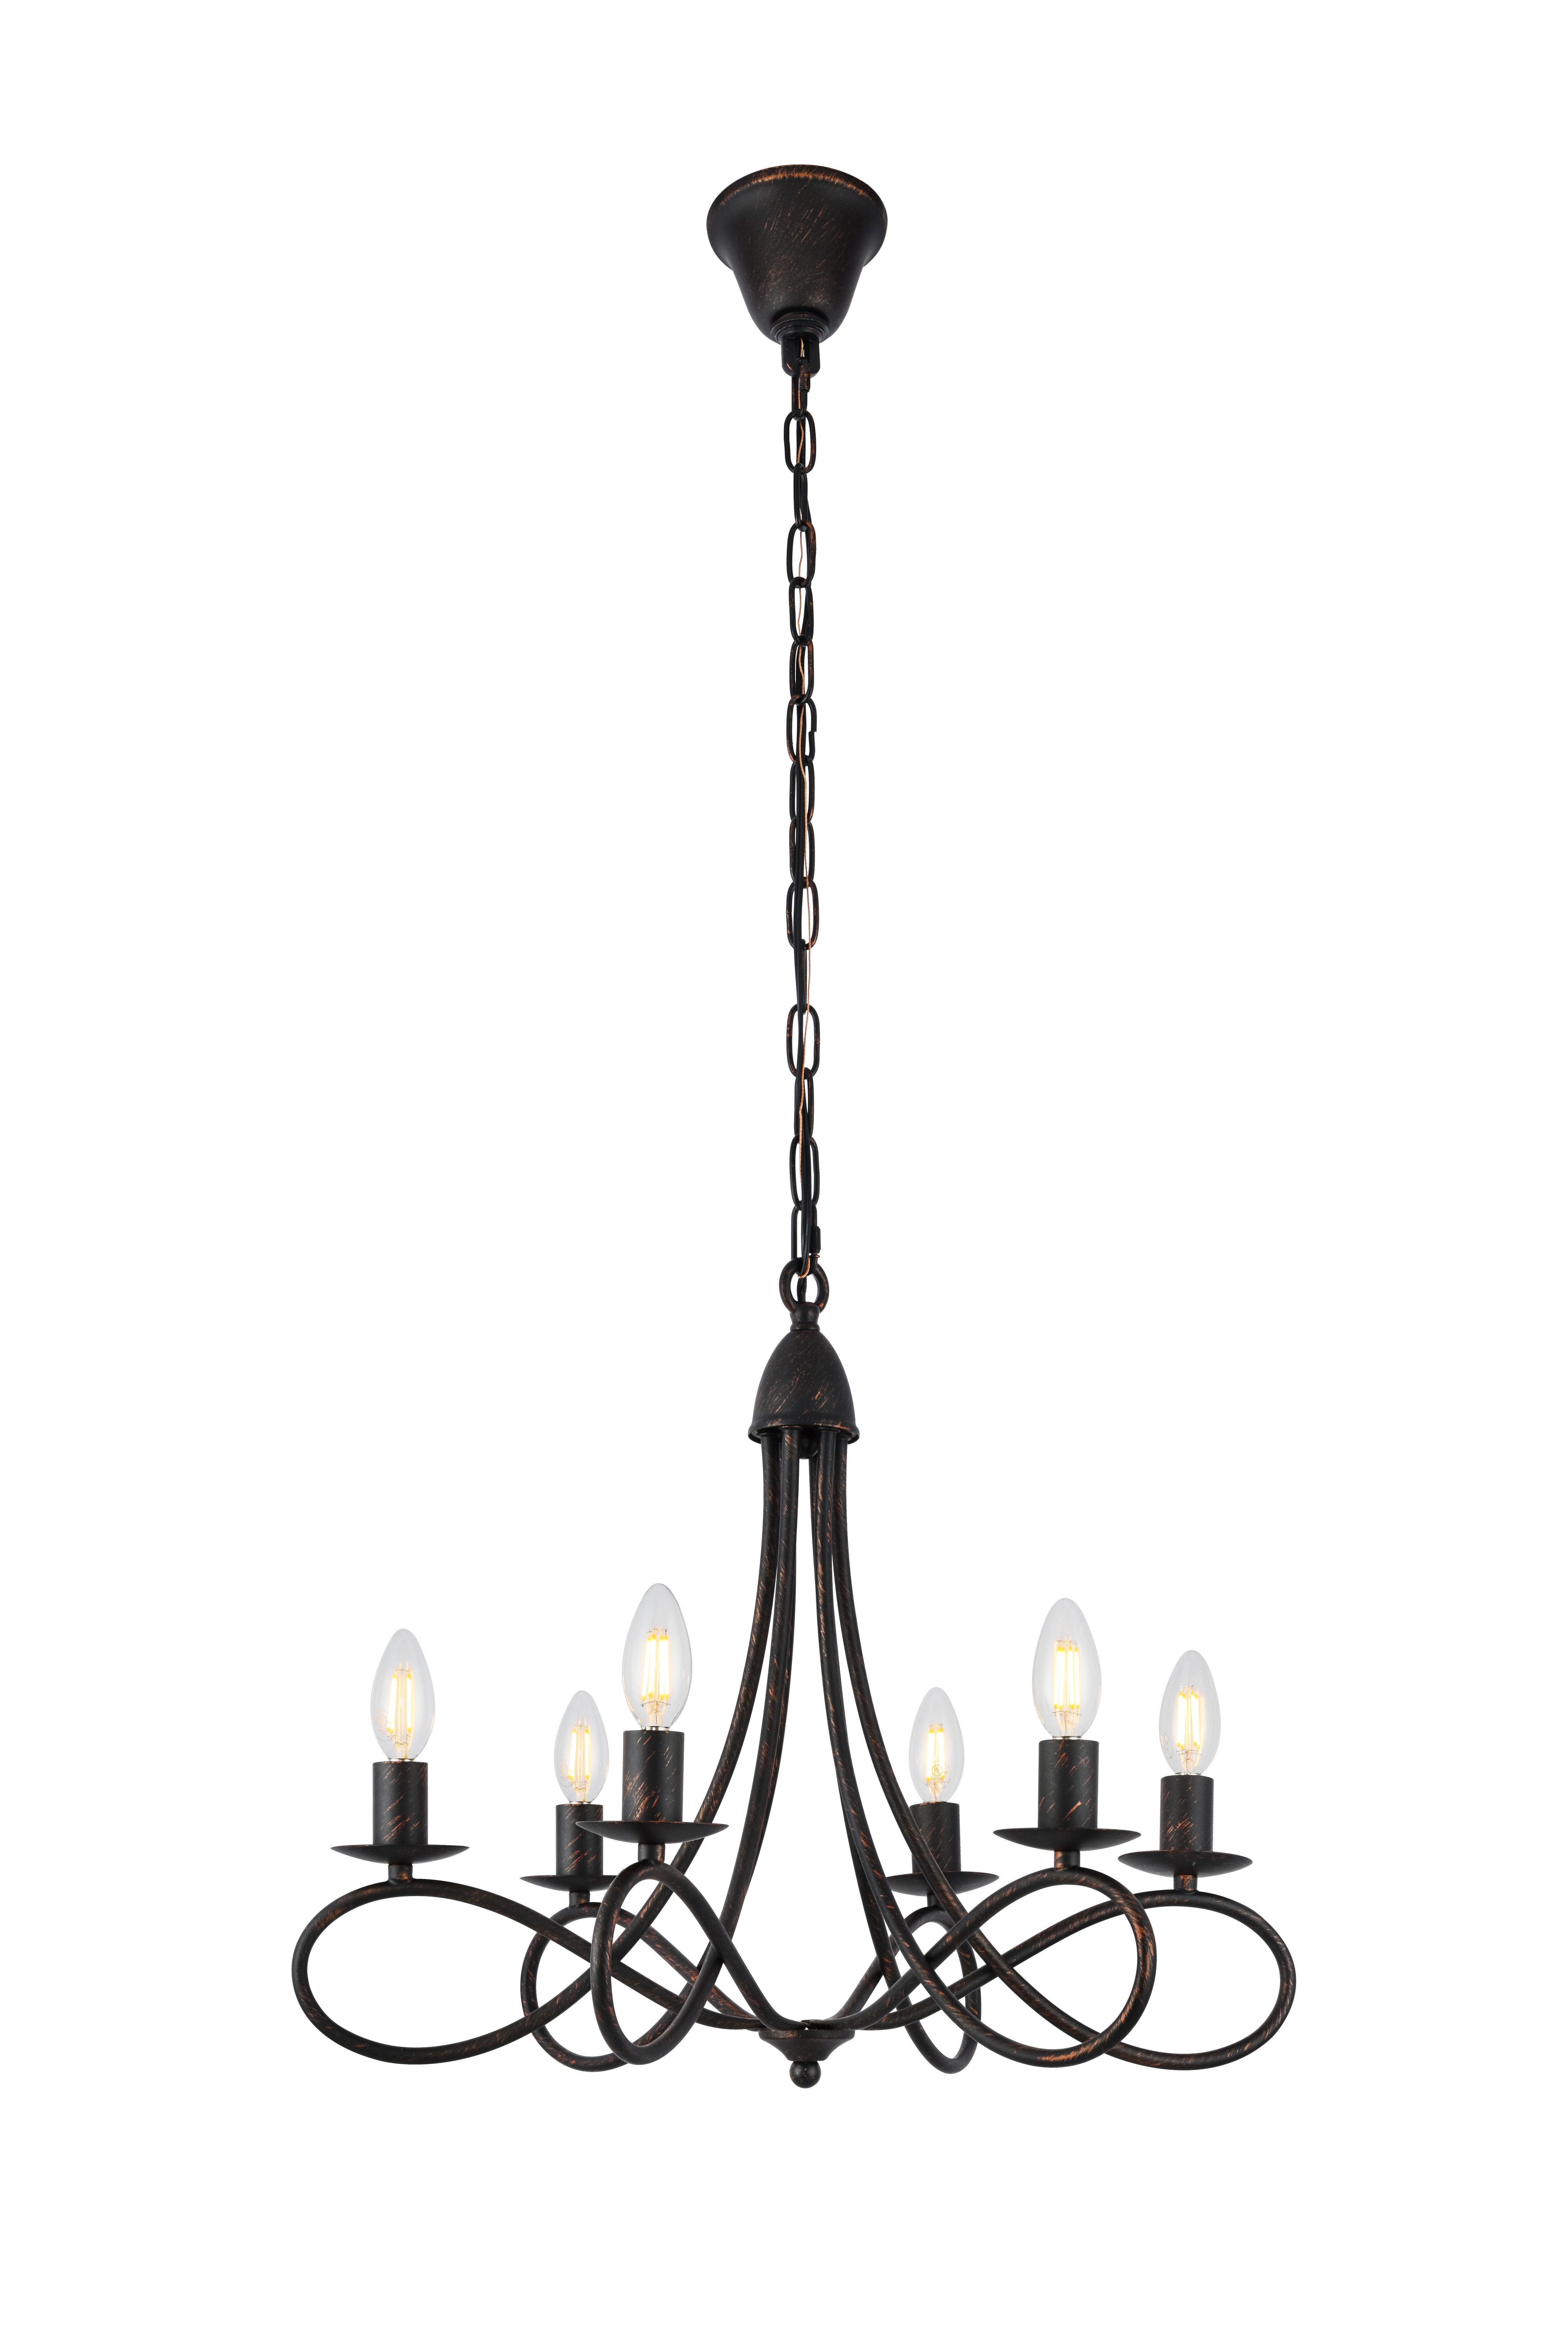 Diaz 6 Light Candle Style Chandelier Regarding Perseus 6 Light Candle Style Chandeliers (Gallery 10 of 30)